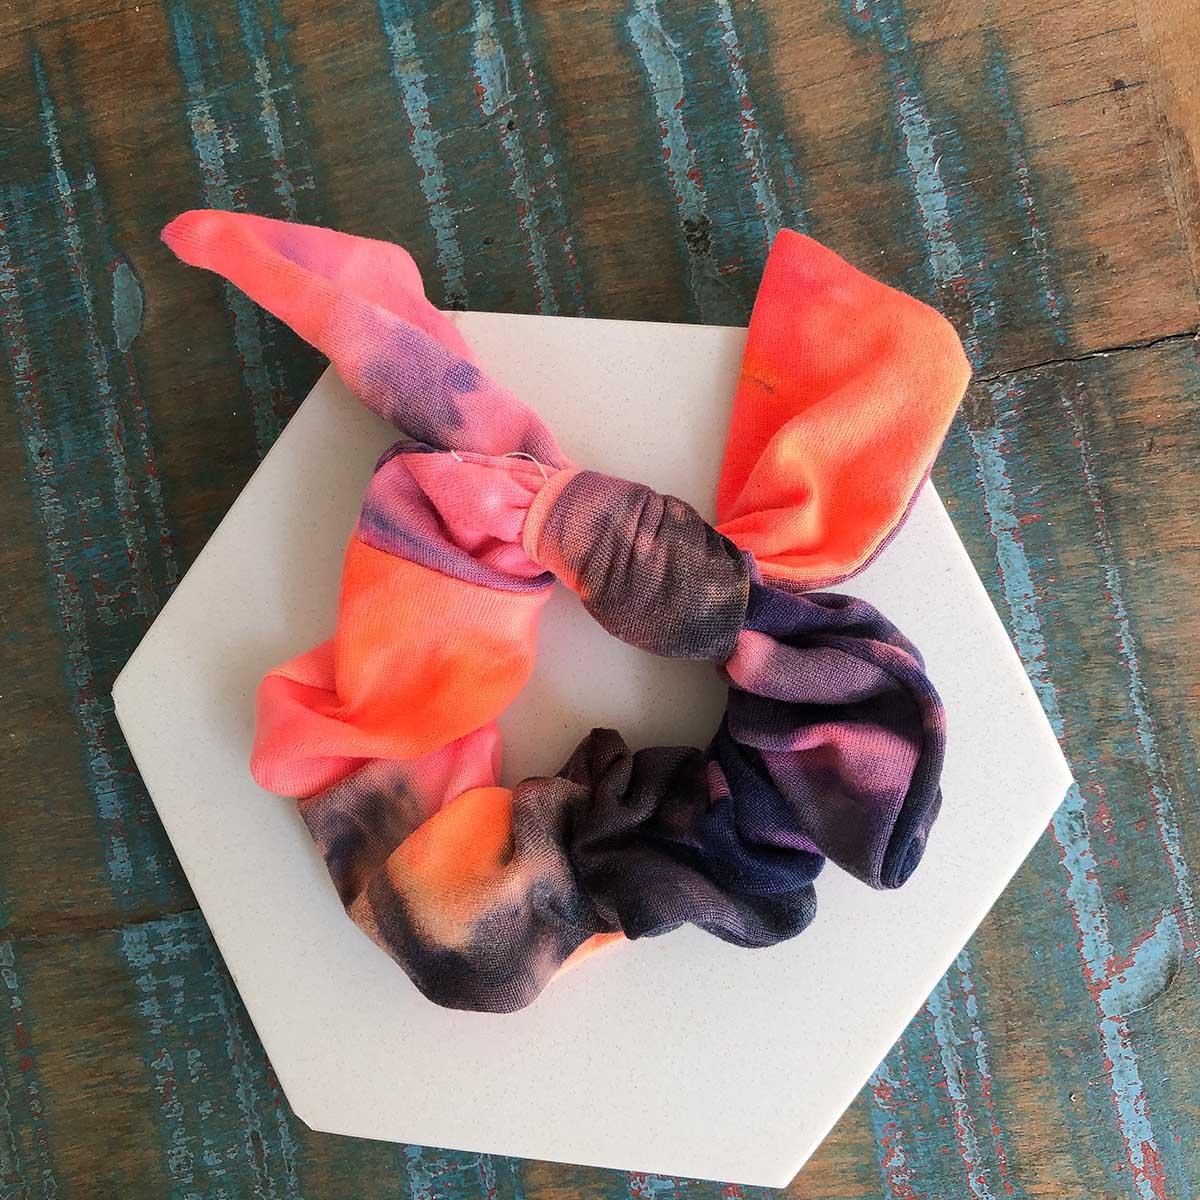 Scrunchie Tie Dye Laranja Rosa Marrom